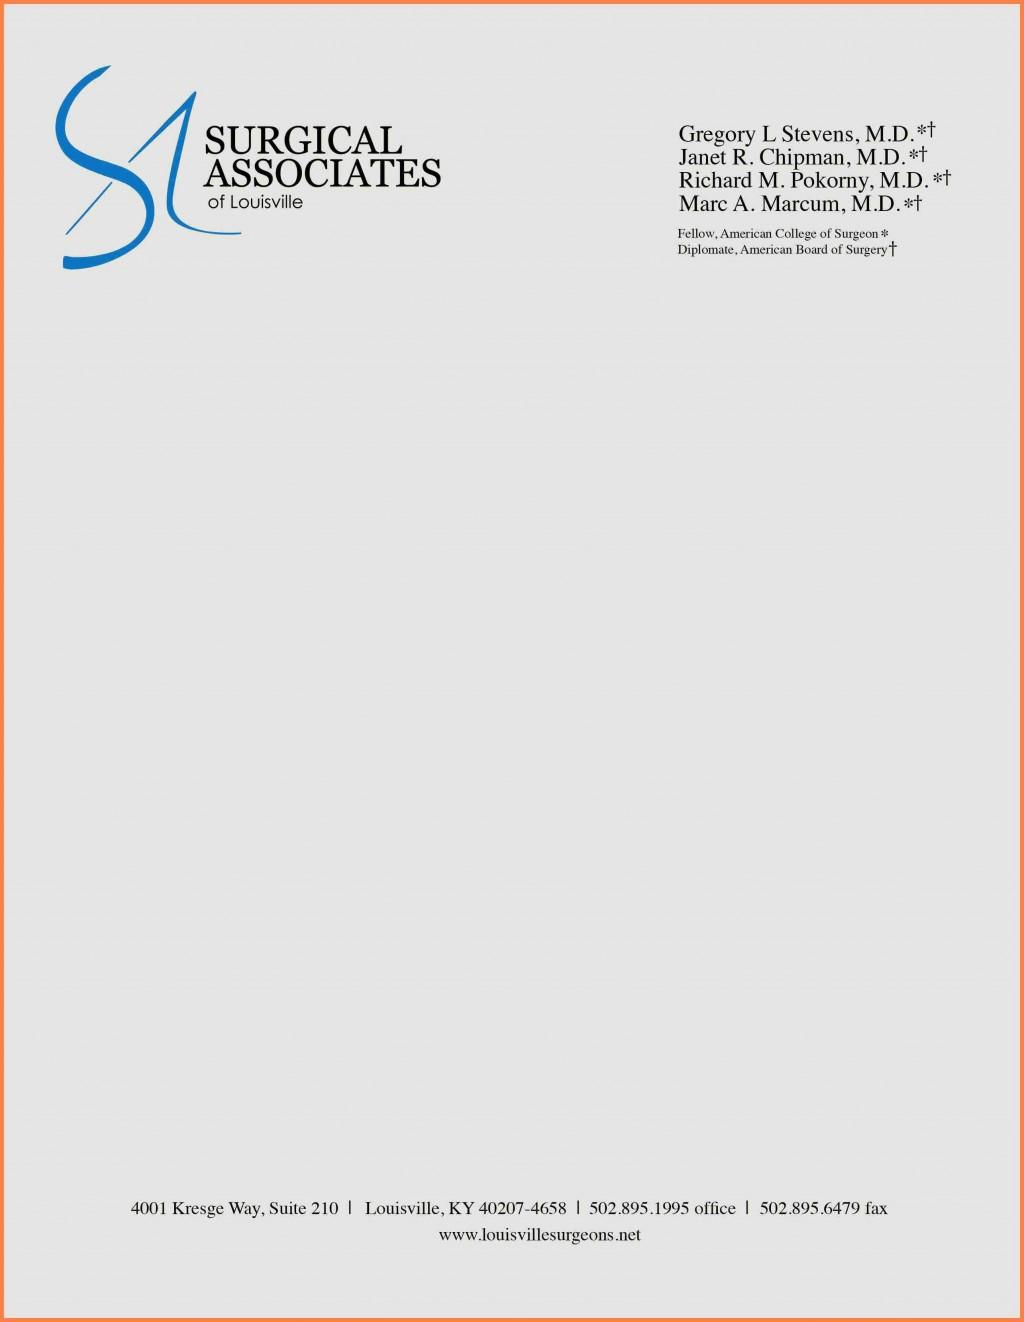 002 Amazing Letterhead Format In Word Free Download Pdf Idea Large